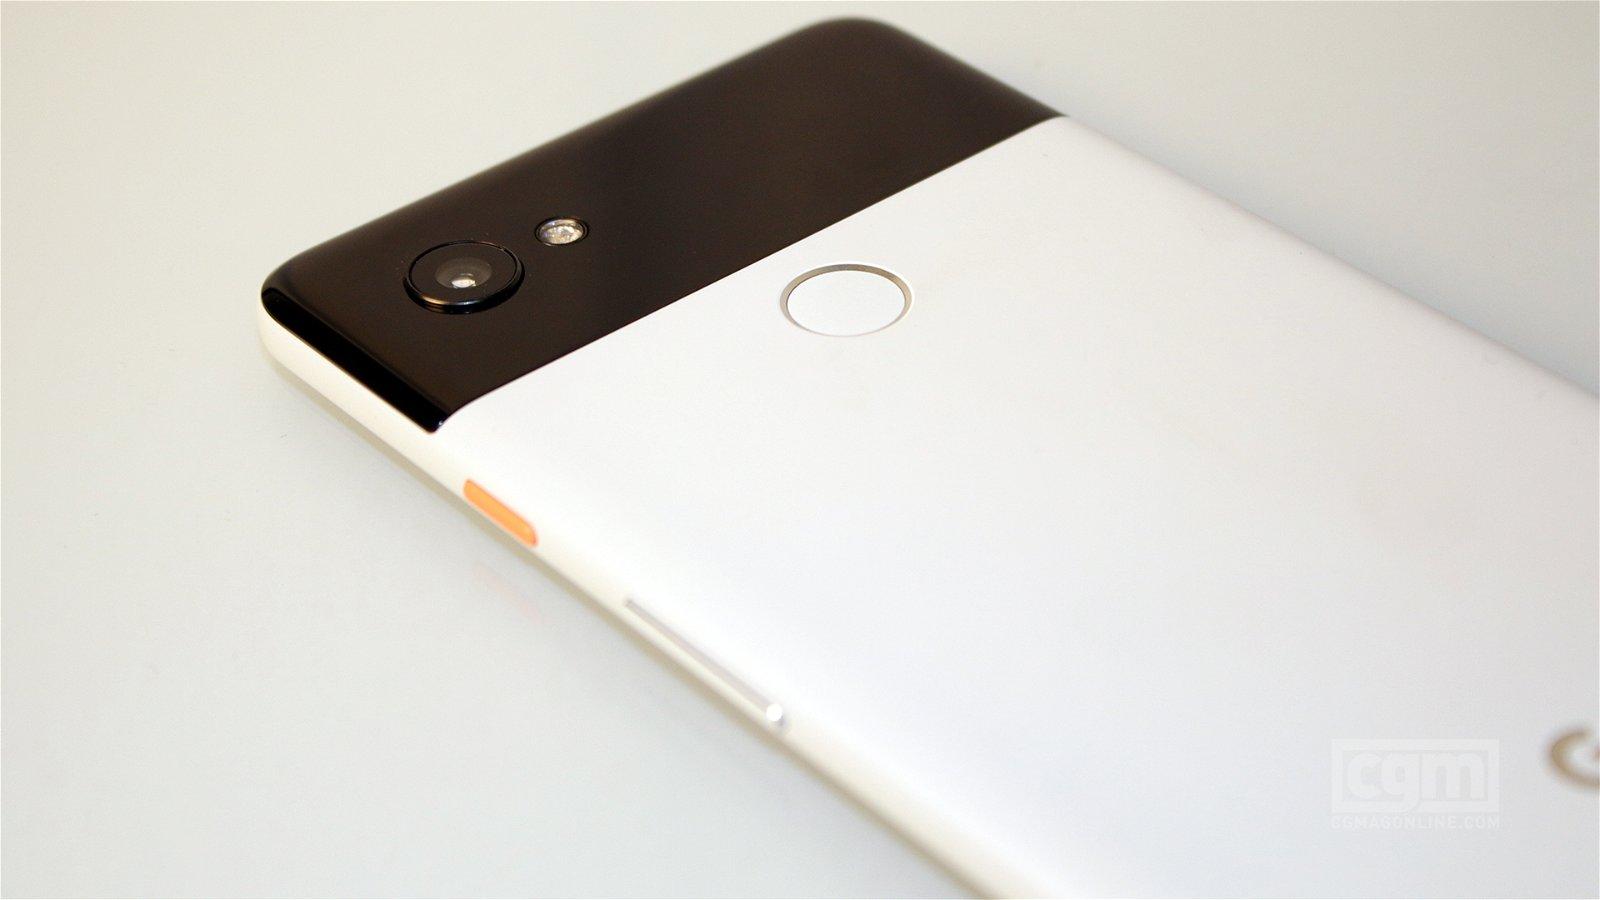 Google Pixel 2 Xl Review: A Controversial Flagship 4